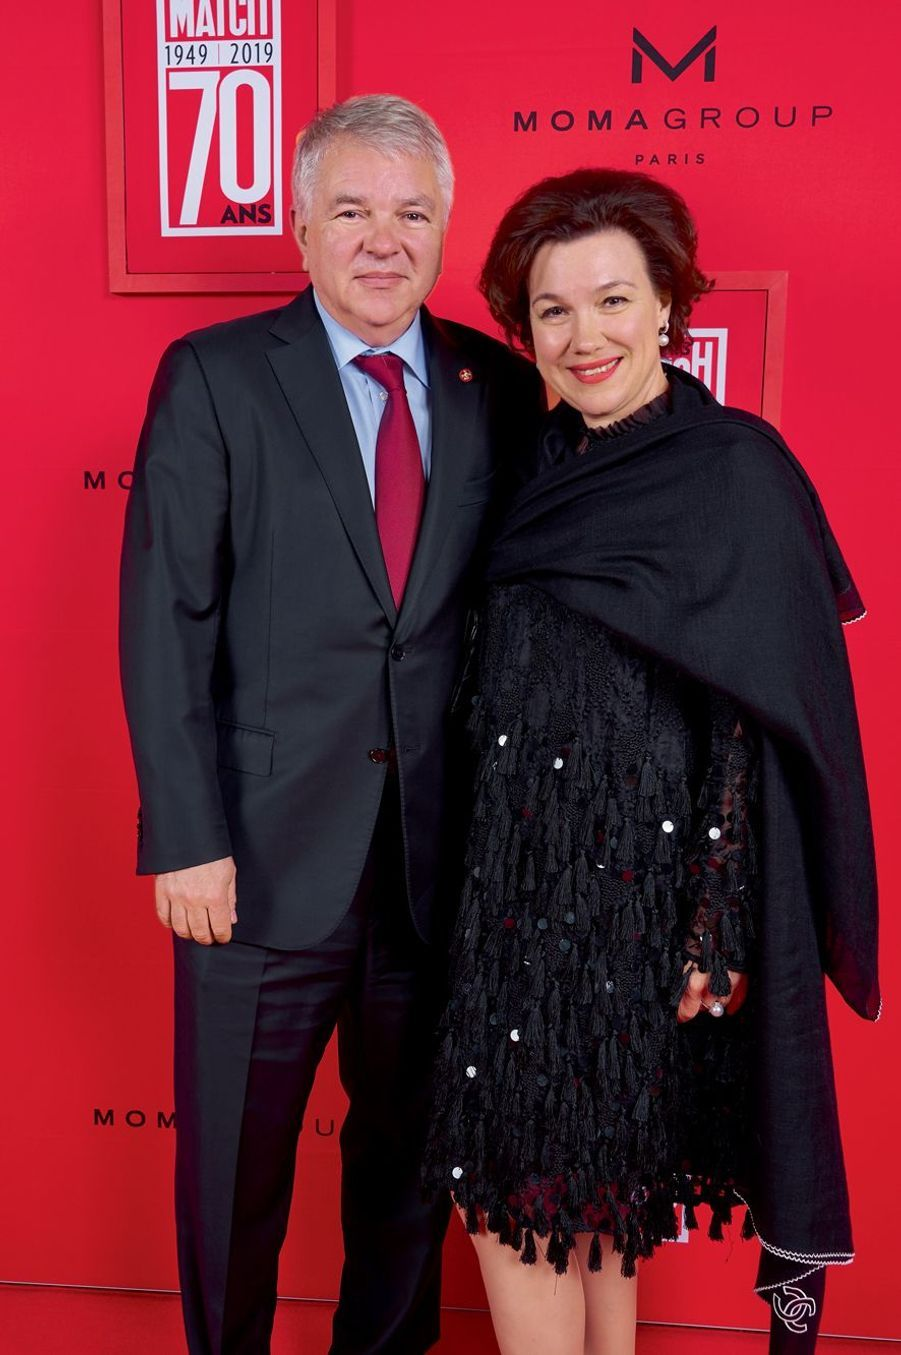 L'ambassadeur de Russie Alexei Mechkov et son épouse Galina.